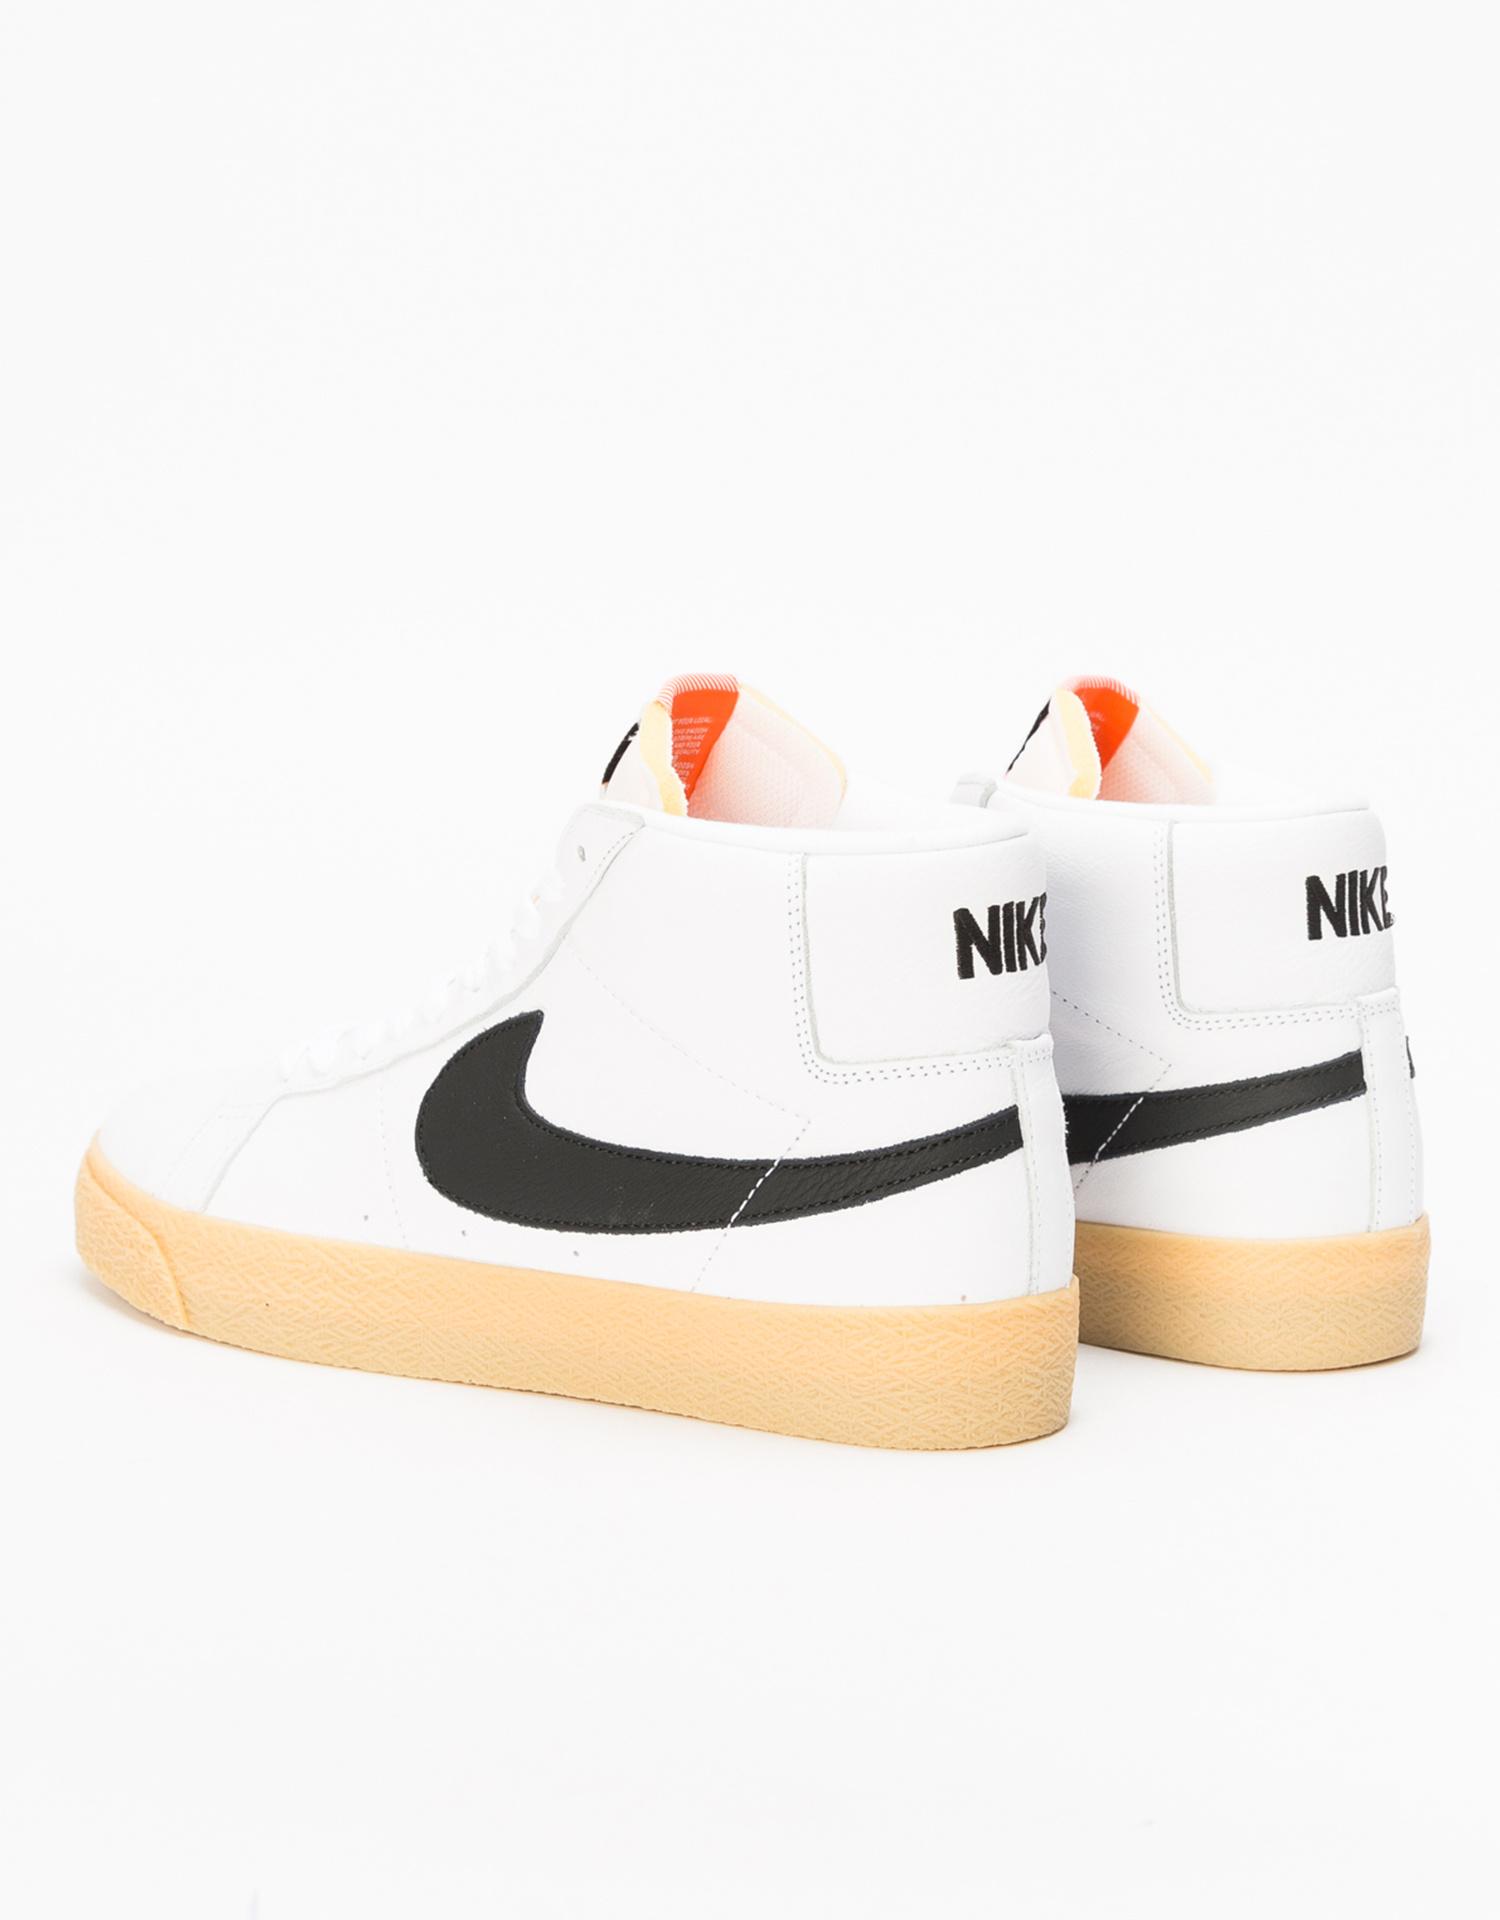 separation shoes 2f709 1f665 ... Nike SB Zoom Blazer Mid ISO Orange Label white black-safety orange ...